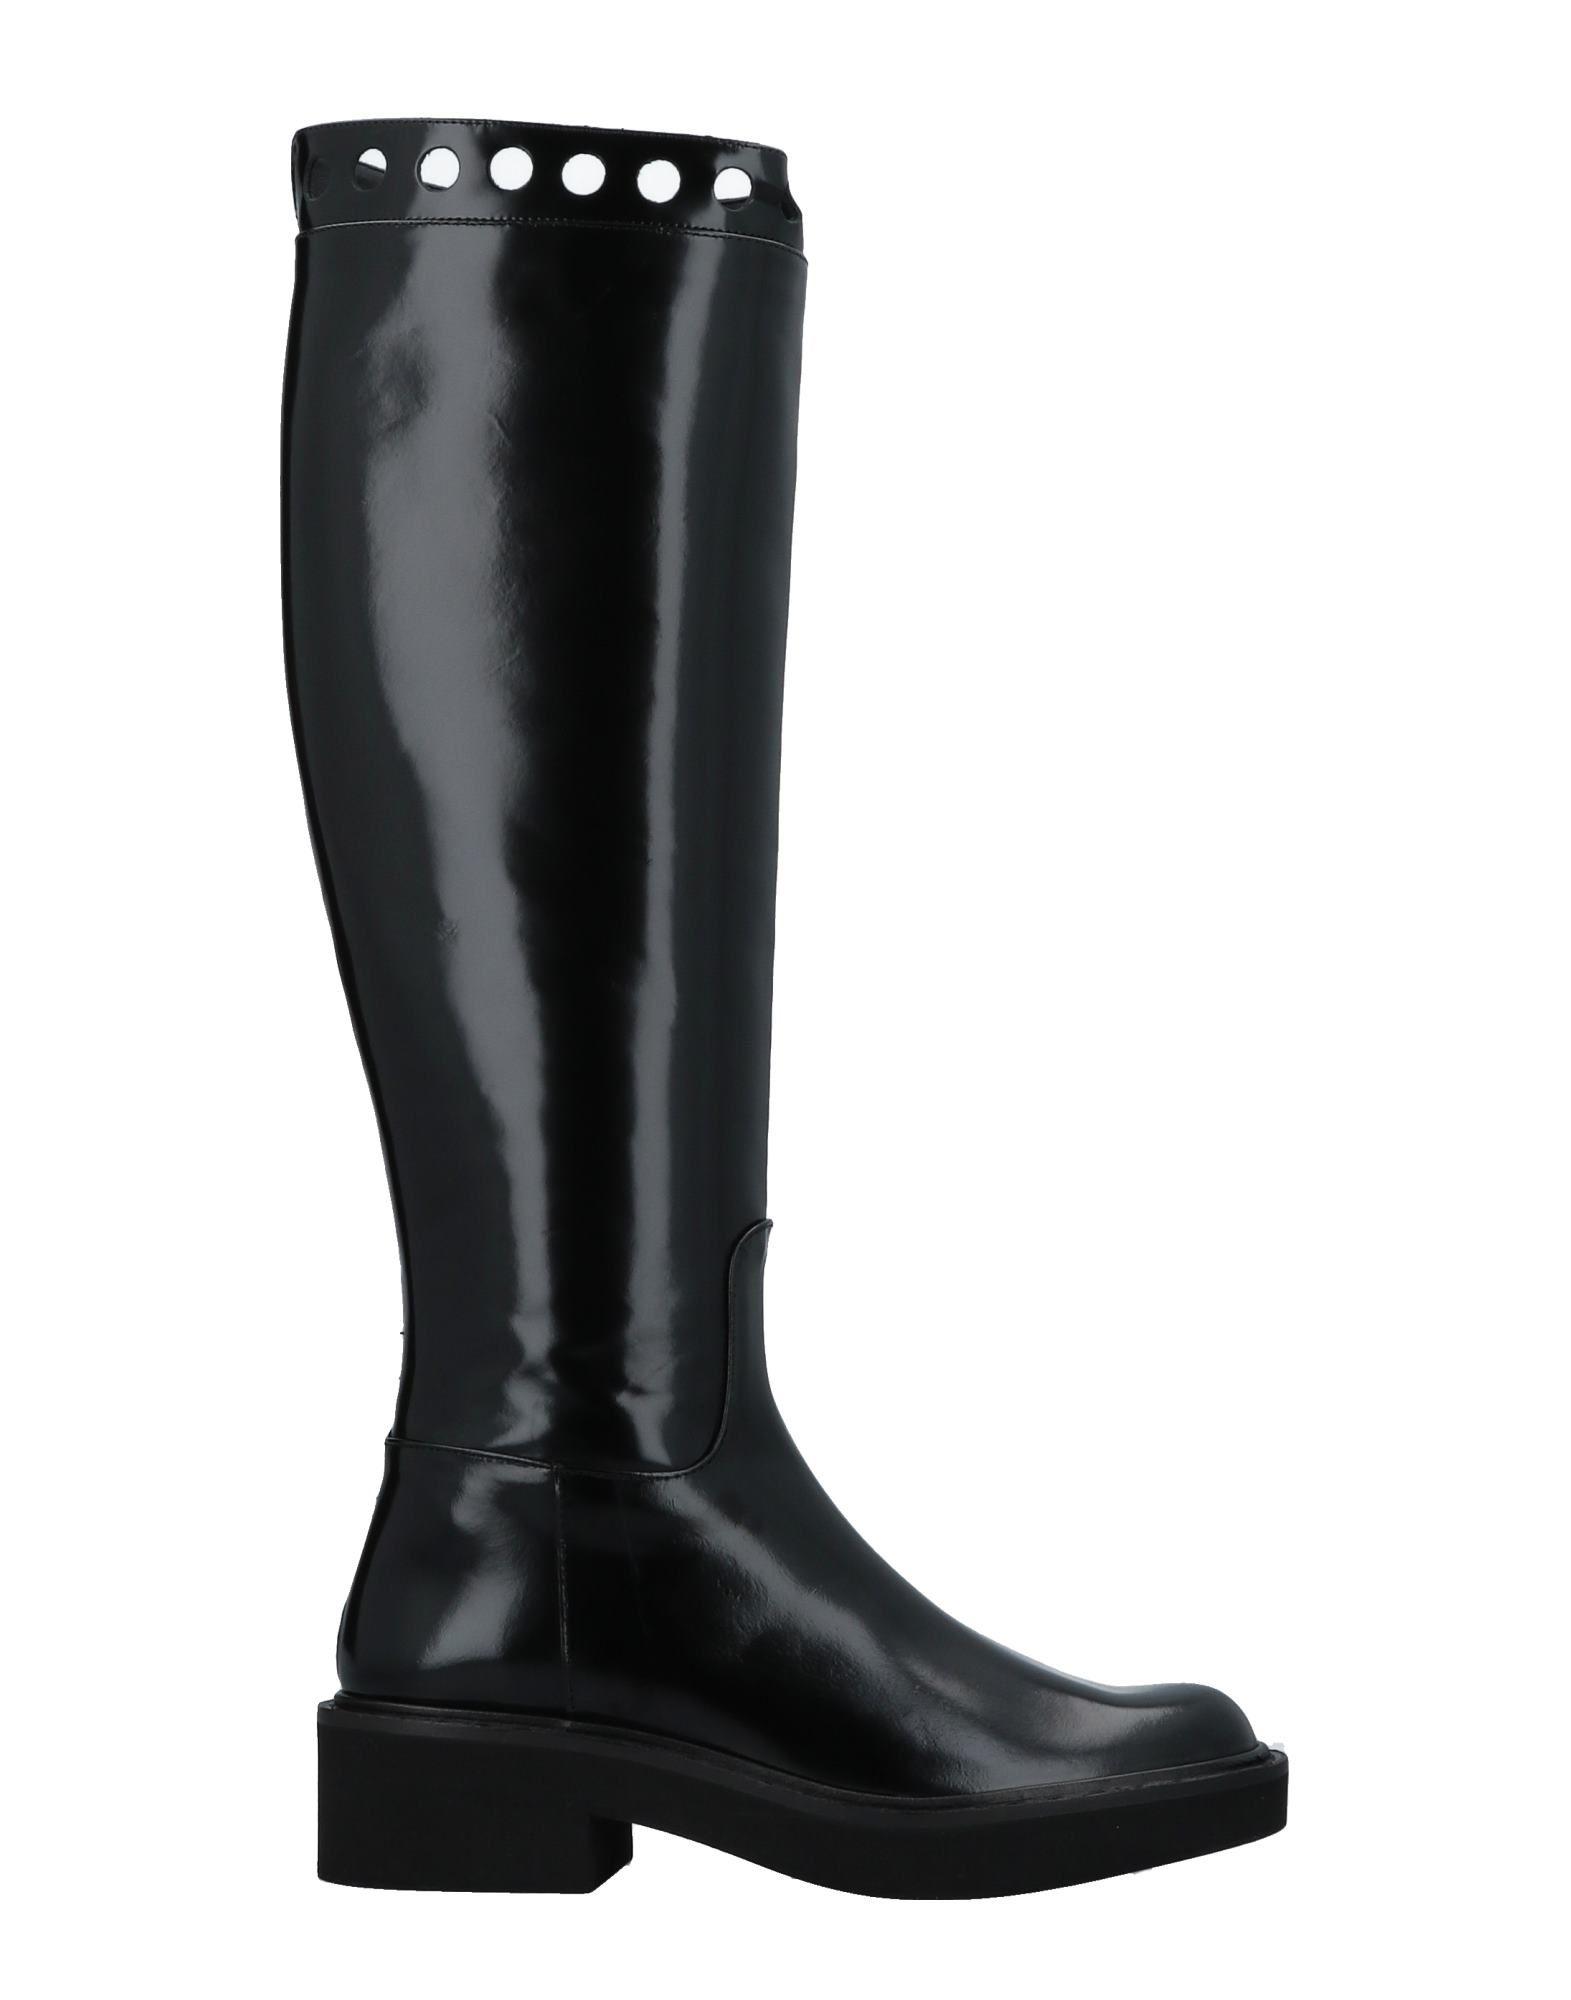 Paloma Paloma Barceló Boots - Women Paloma Paloma Barceló Boots online on  Australia - 11511701PW 0f0a02